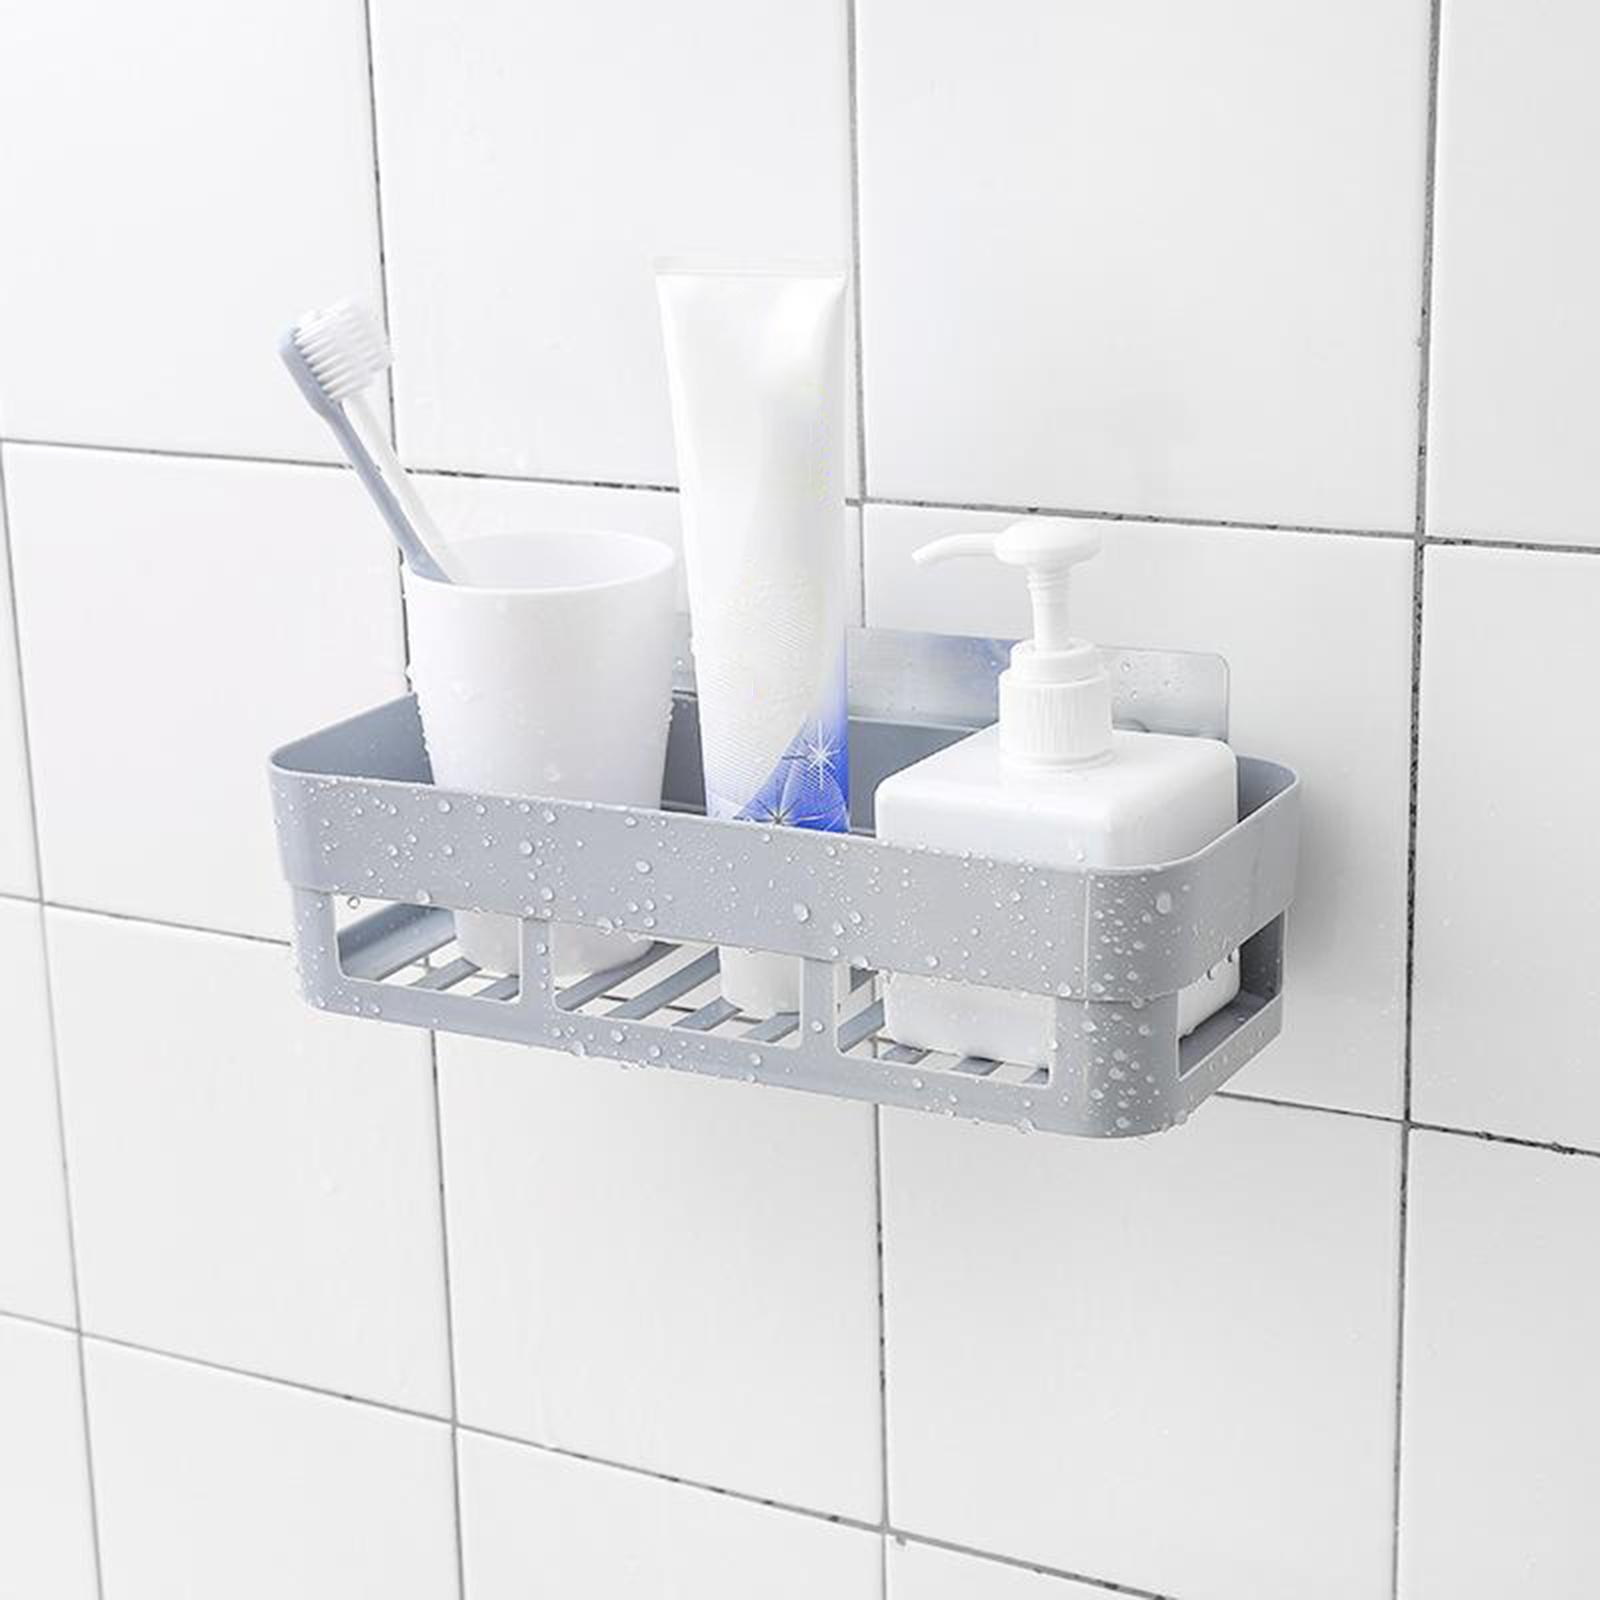 thumbnail 29 - Wall-Suction-Bathroom-Shelf-Shower-Caddy-Wall-Mount-Storage-Rack-Organizer